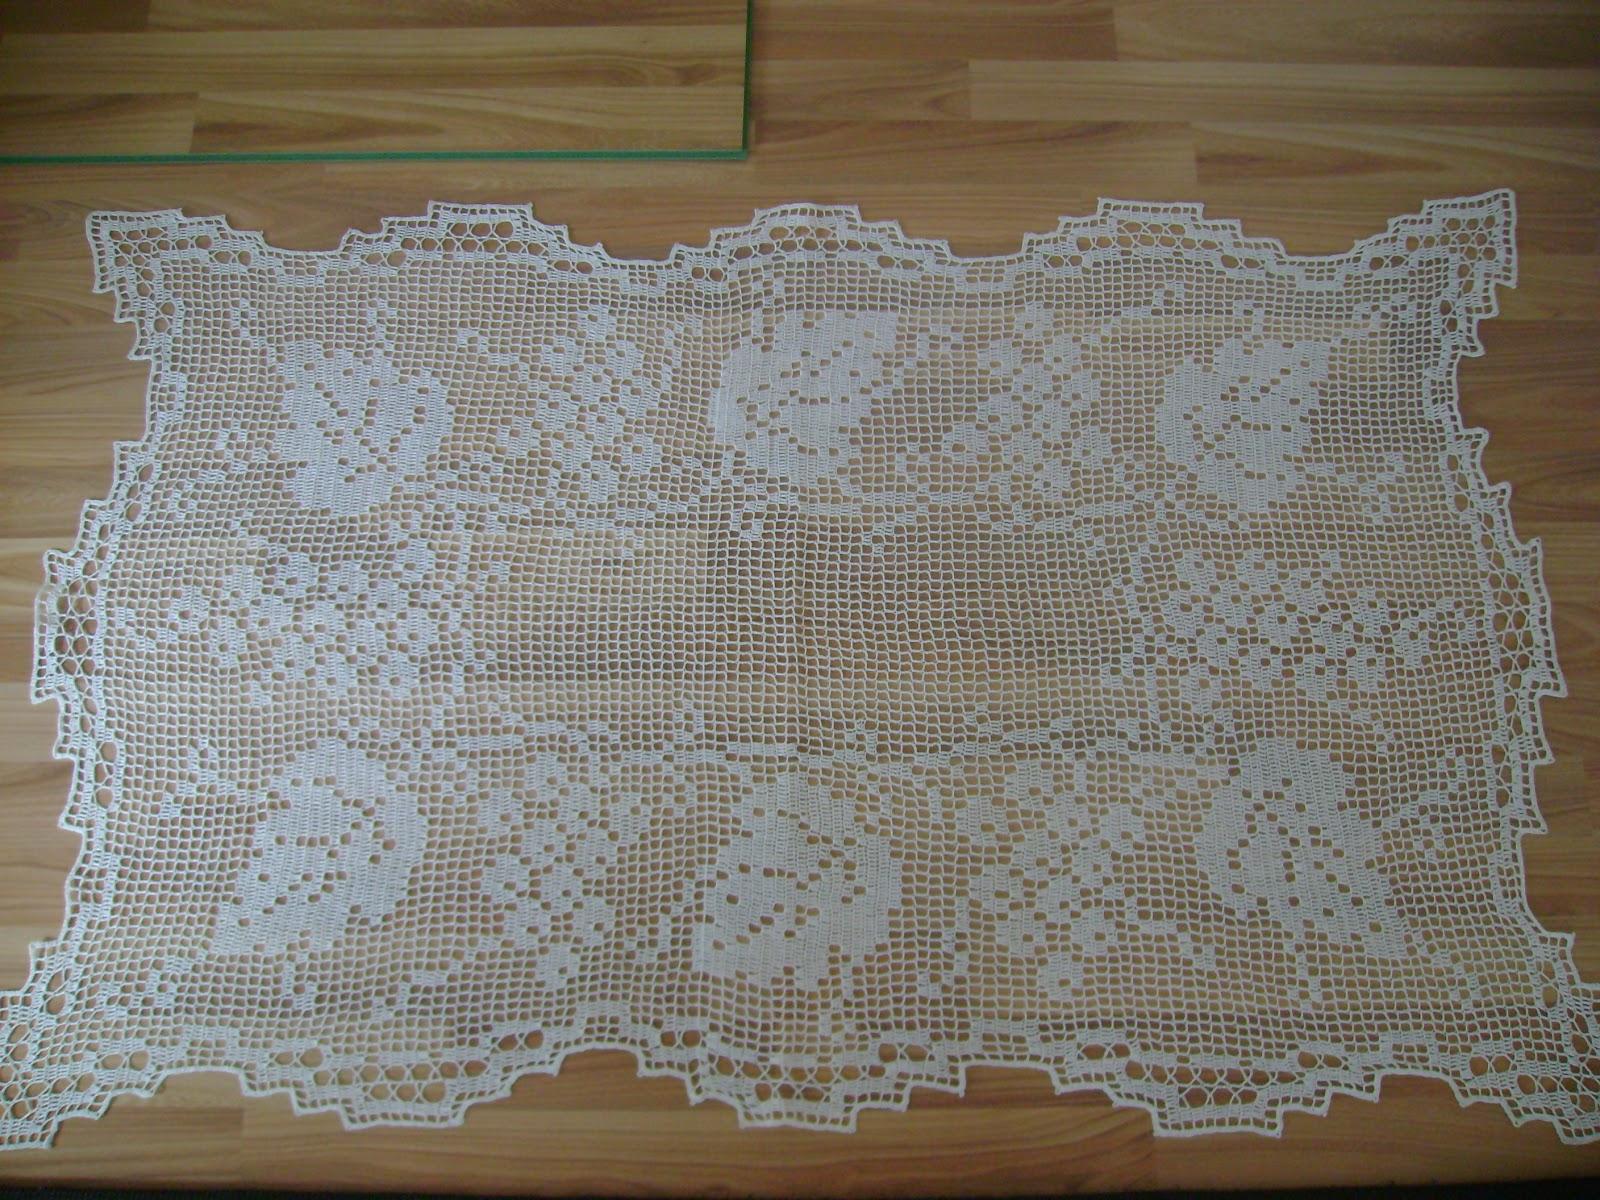 Crochet On Sale: Crochet Tablecloths